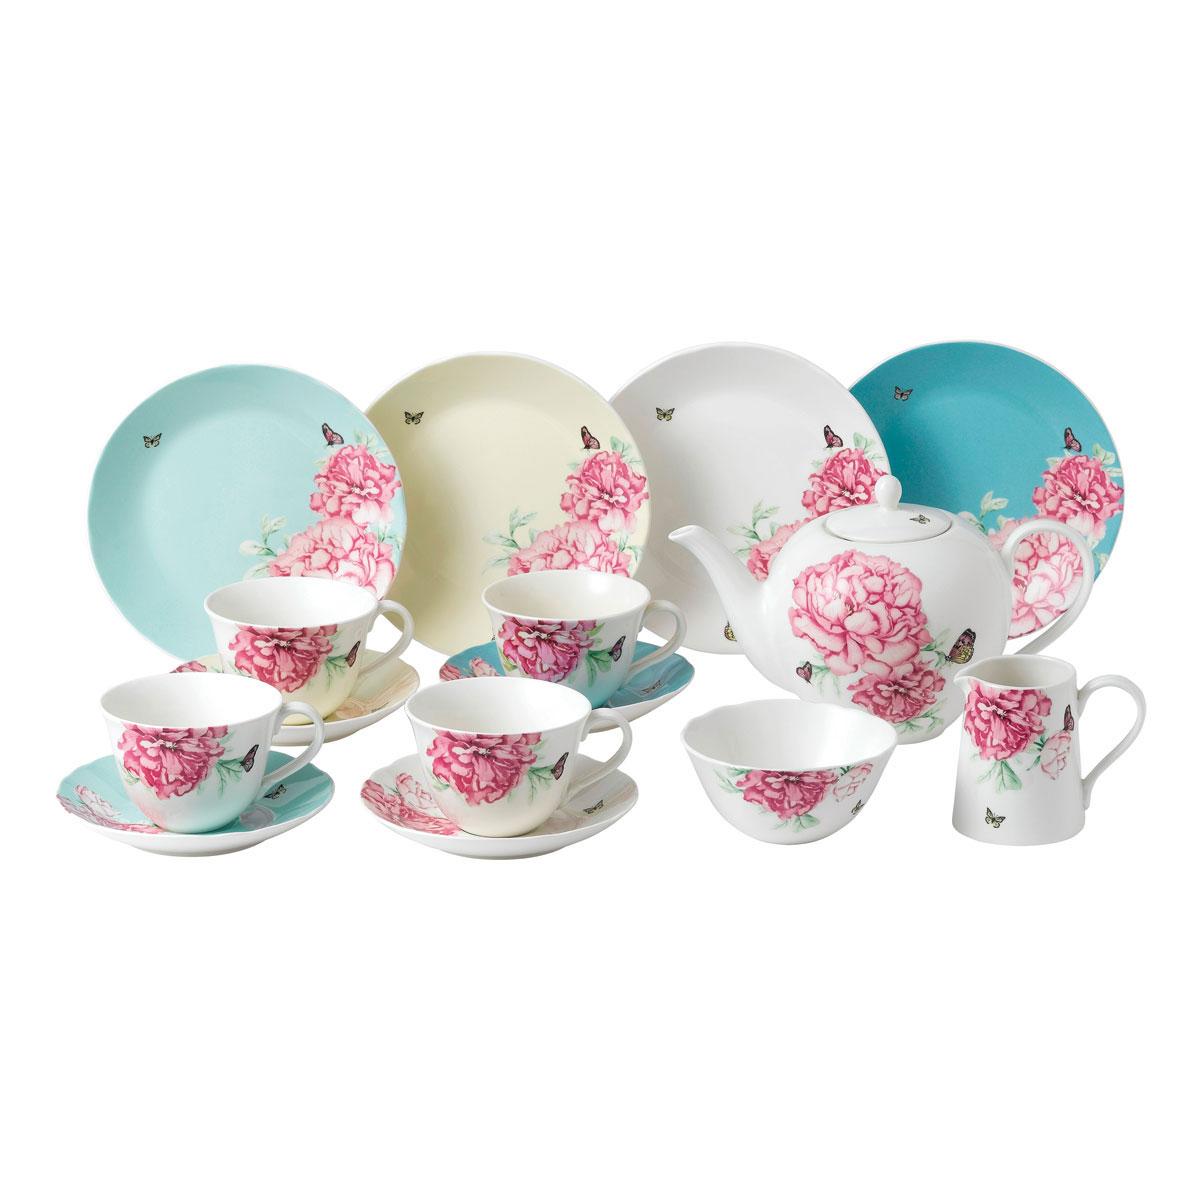 Royal Albert Everyday Friendship 15-Piece Tea Set